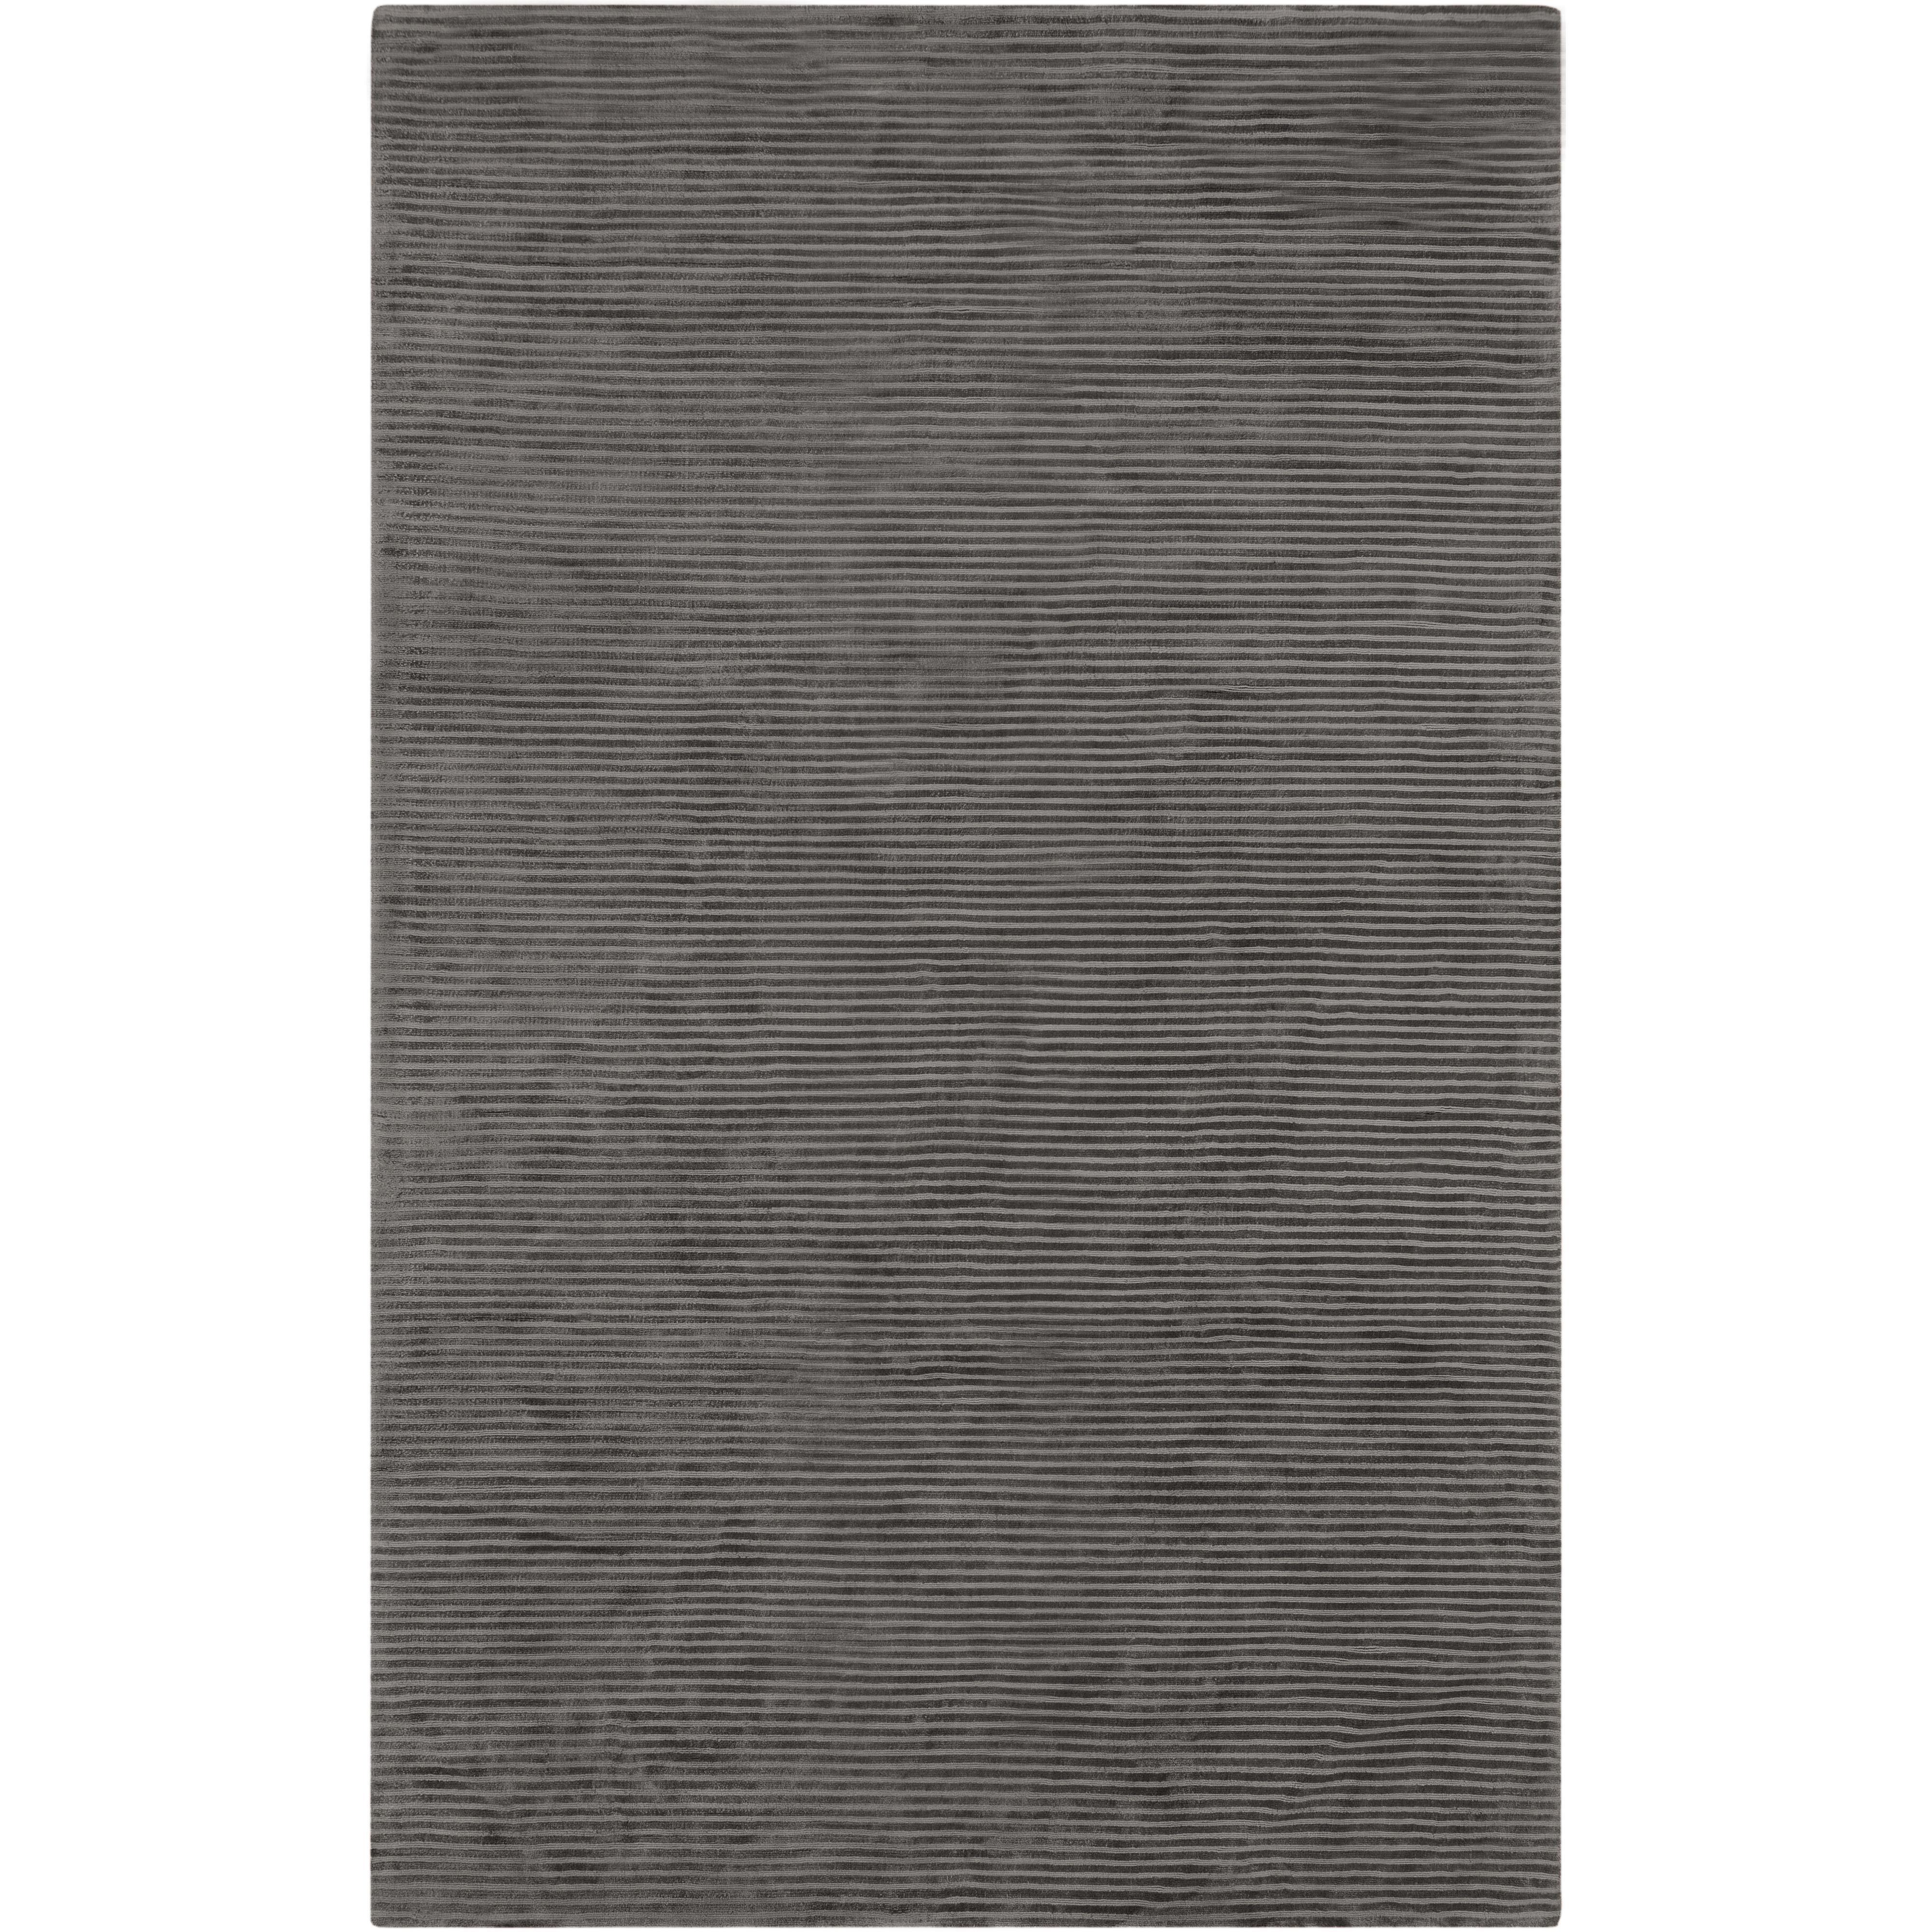 Surya Rugs Graphite 8' x 11' - Item Number: GPH53-811